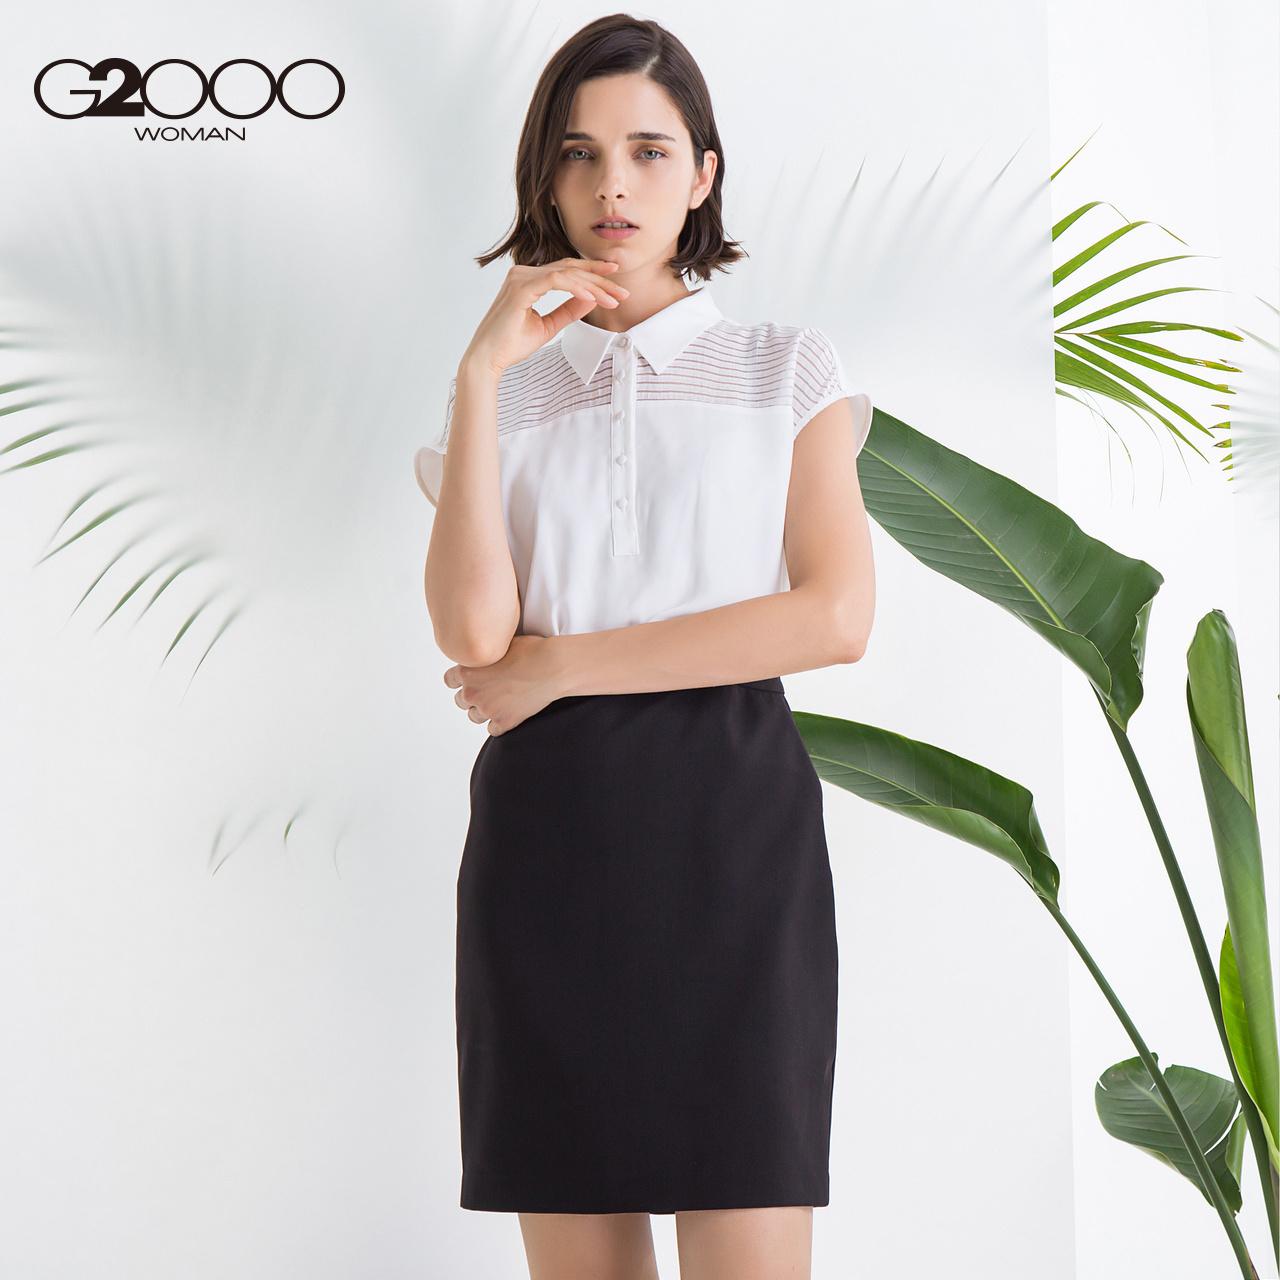 G2000女装商务休闲连衣裙 2018夏季新款OL优雅气质假两件衬衫短裙